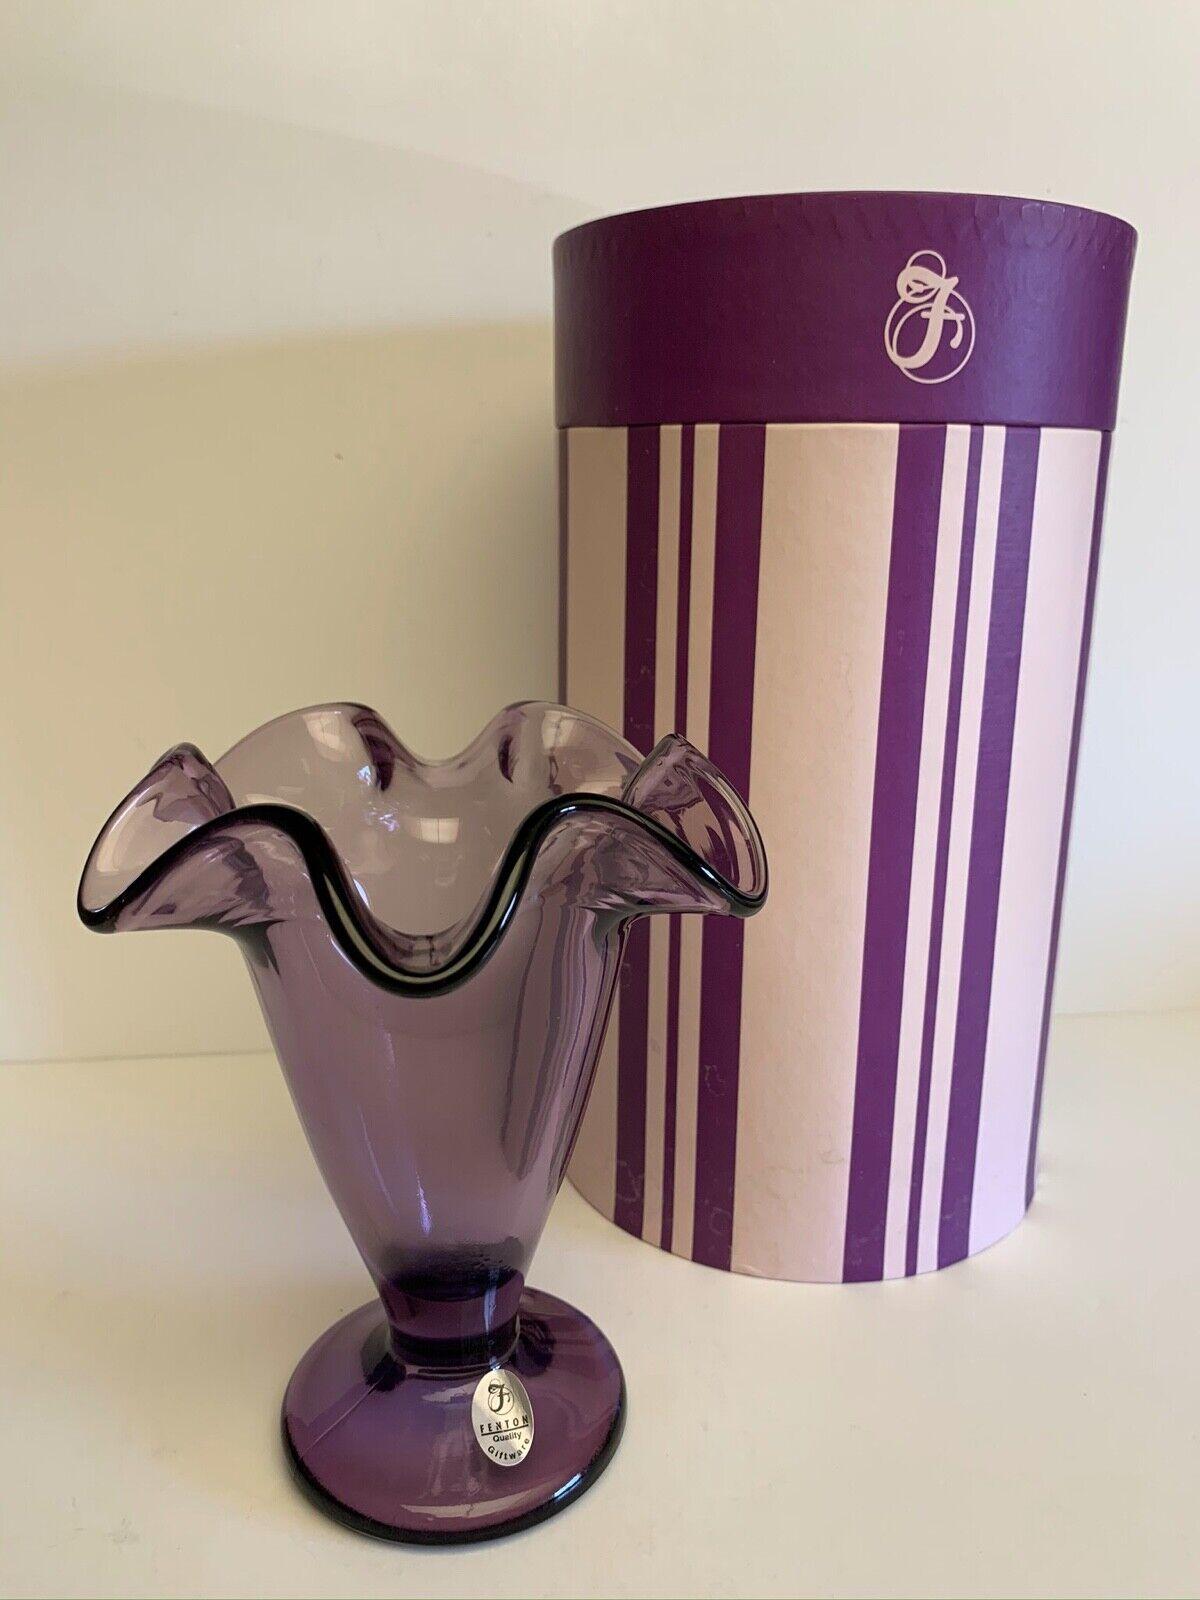 Fenton Violet 6 Vase New In Box - $14.99